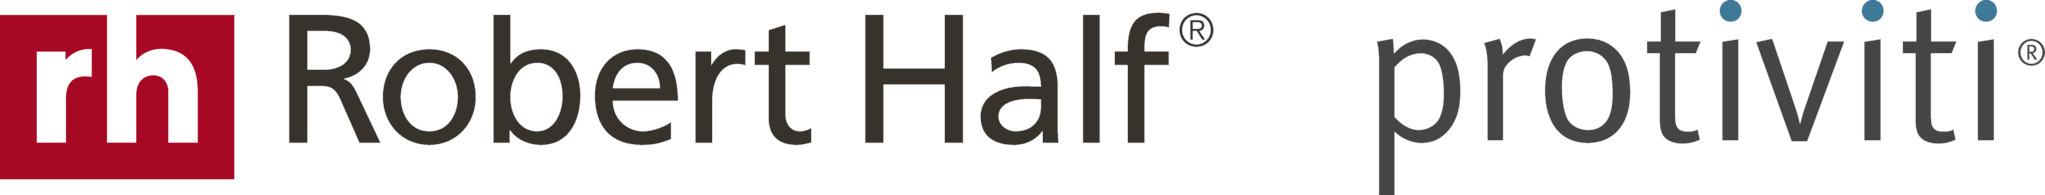 Robert Half | Protiviti